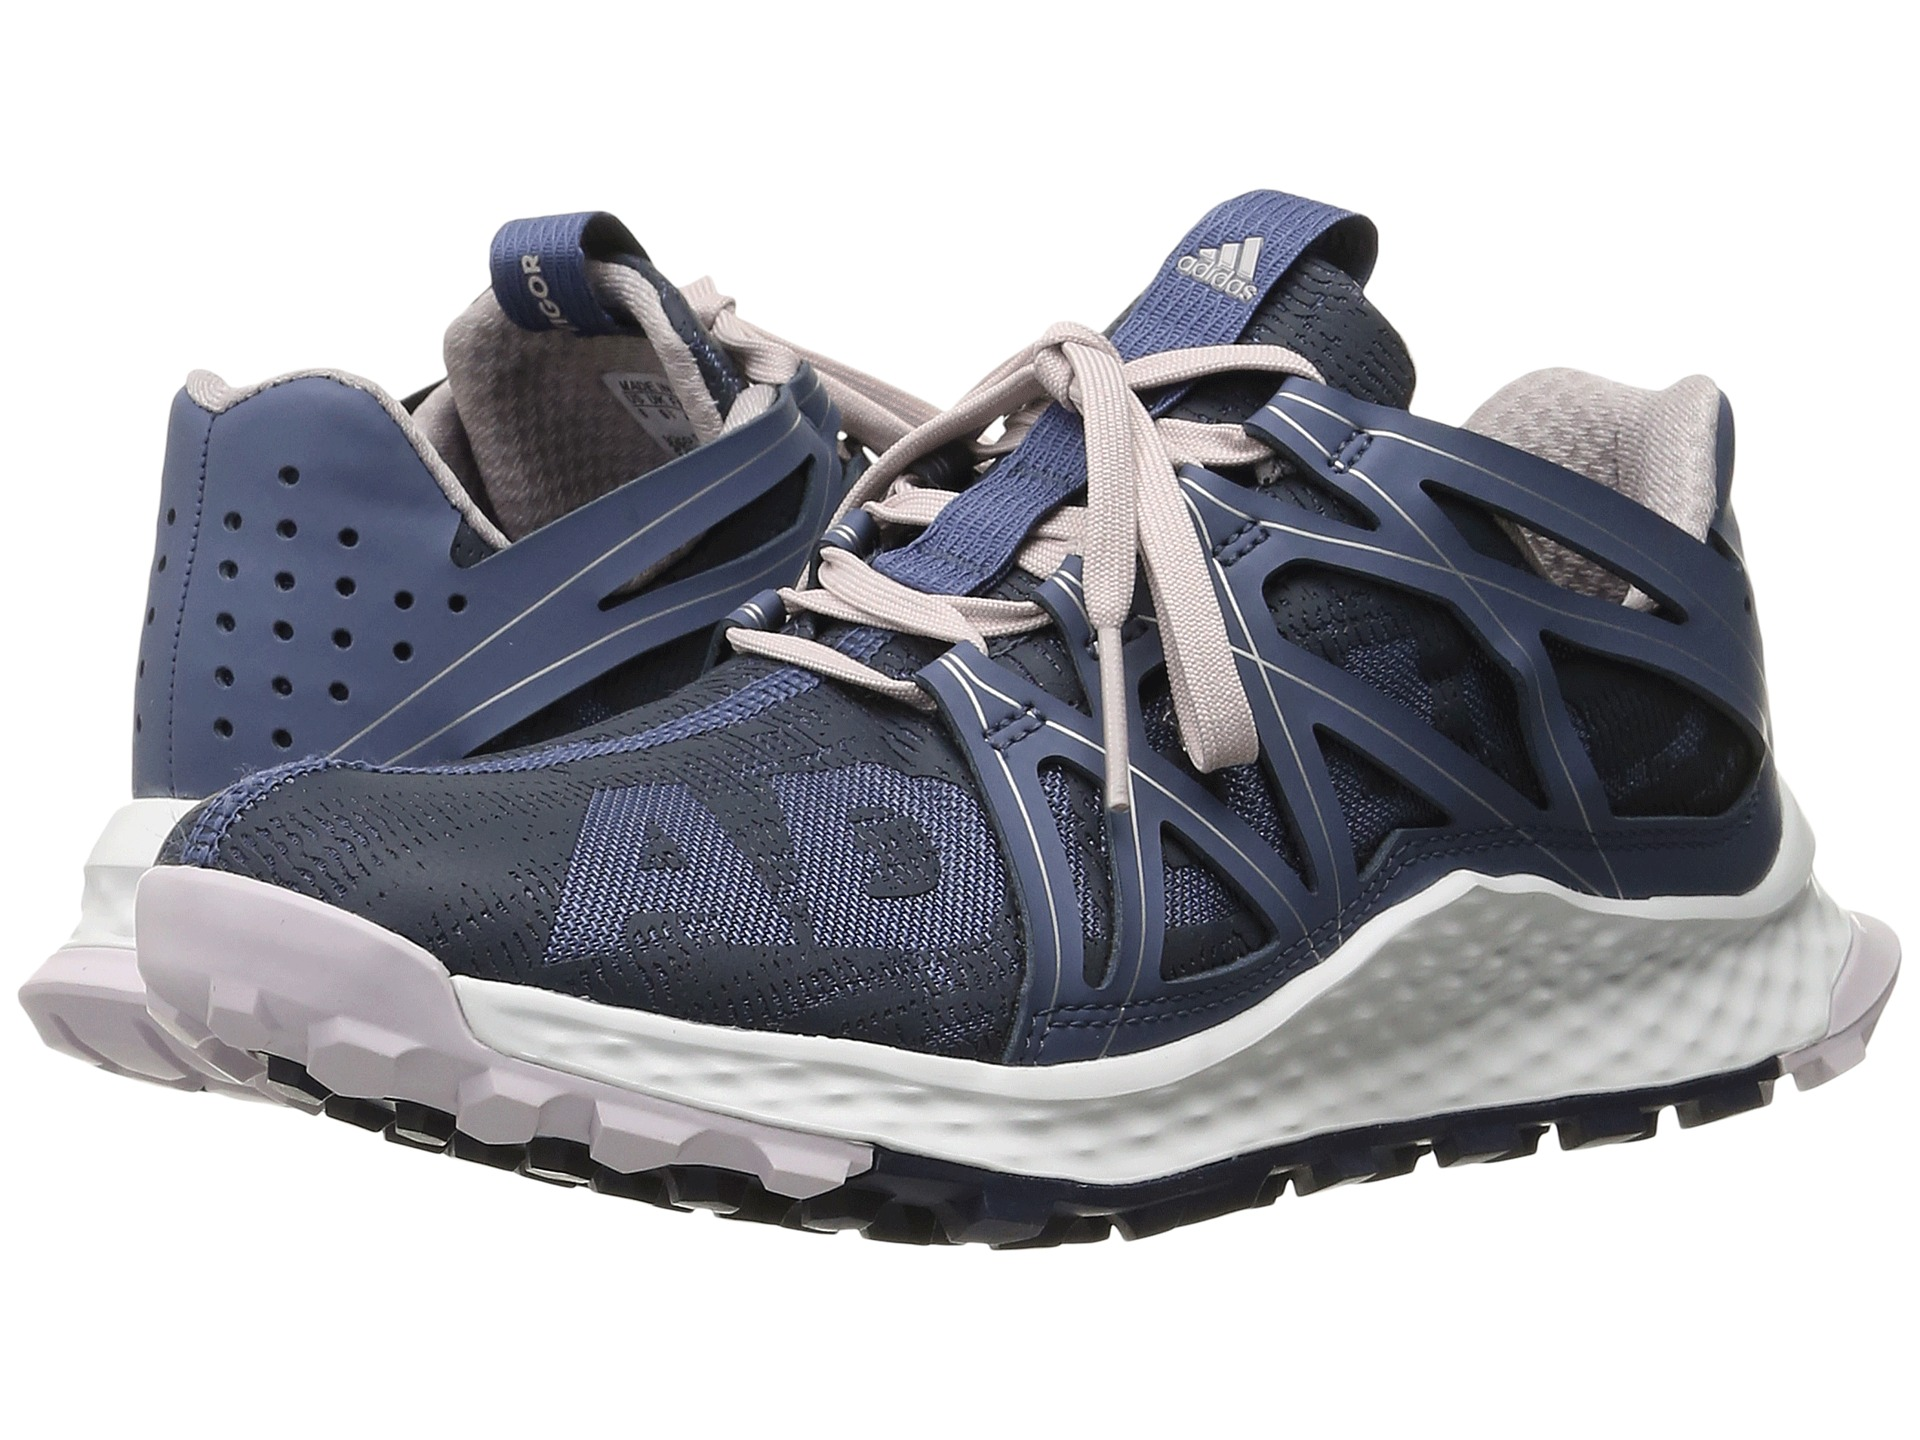 Adidas Running Shoes For Women Vigor Bounce